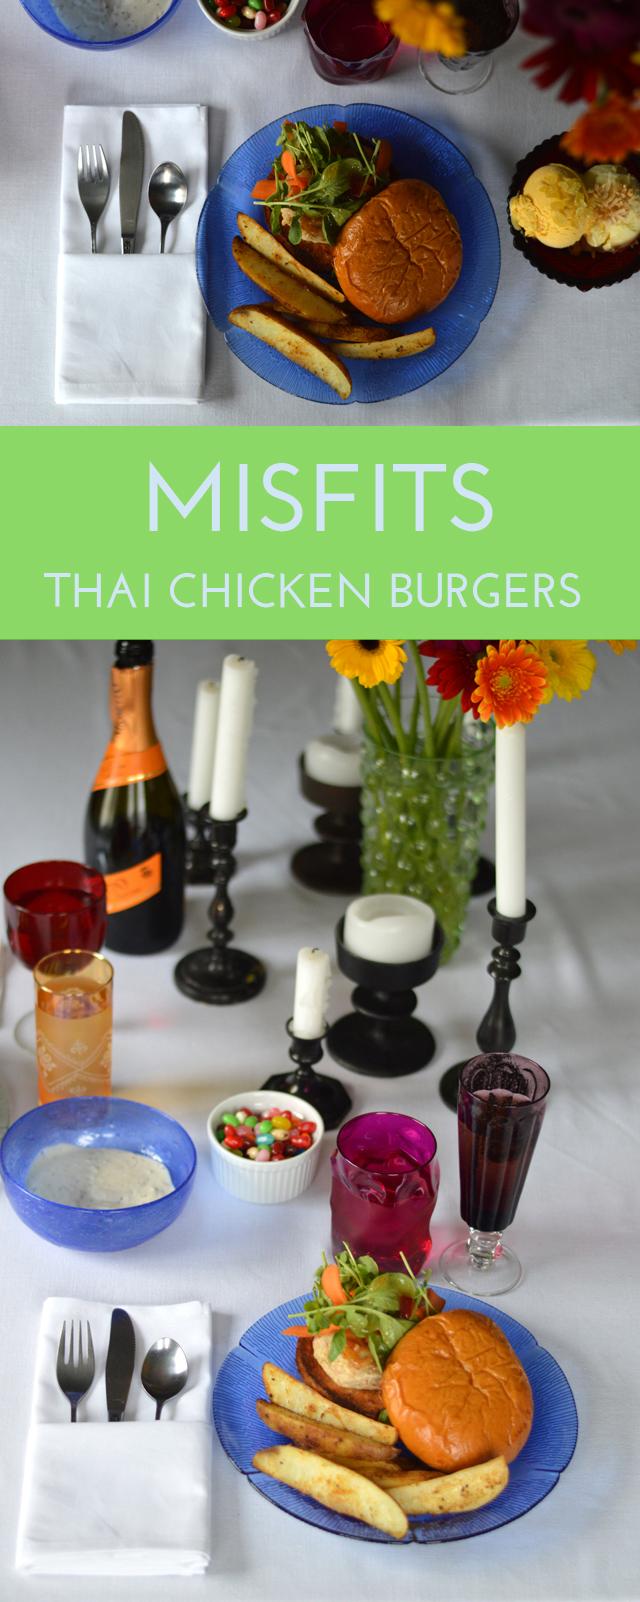 misfits-chicken-burgers-pinterest